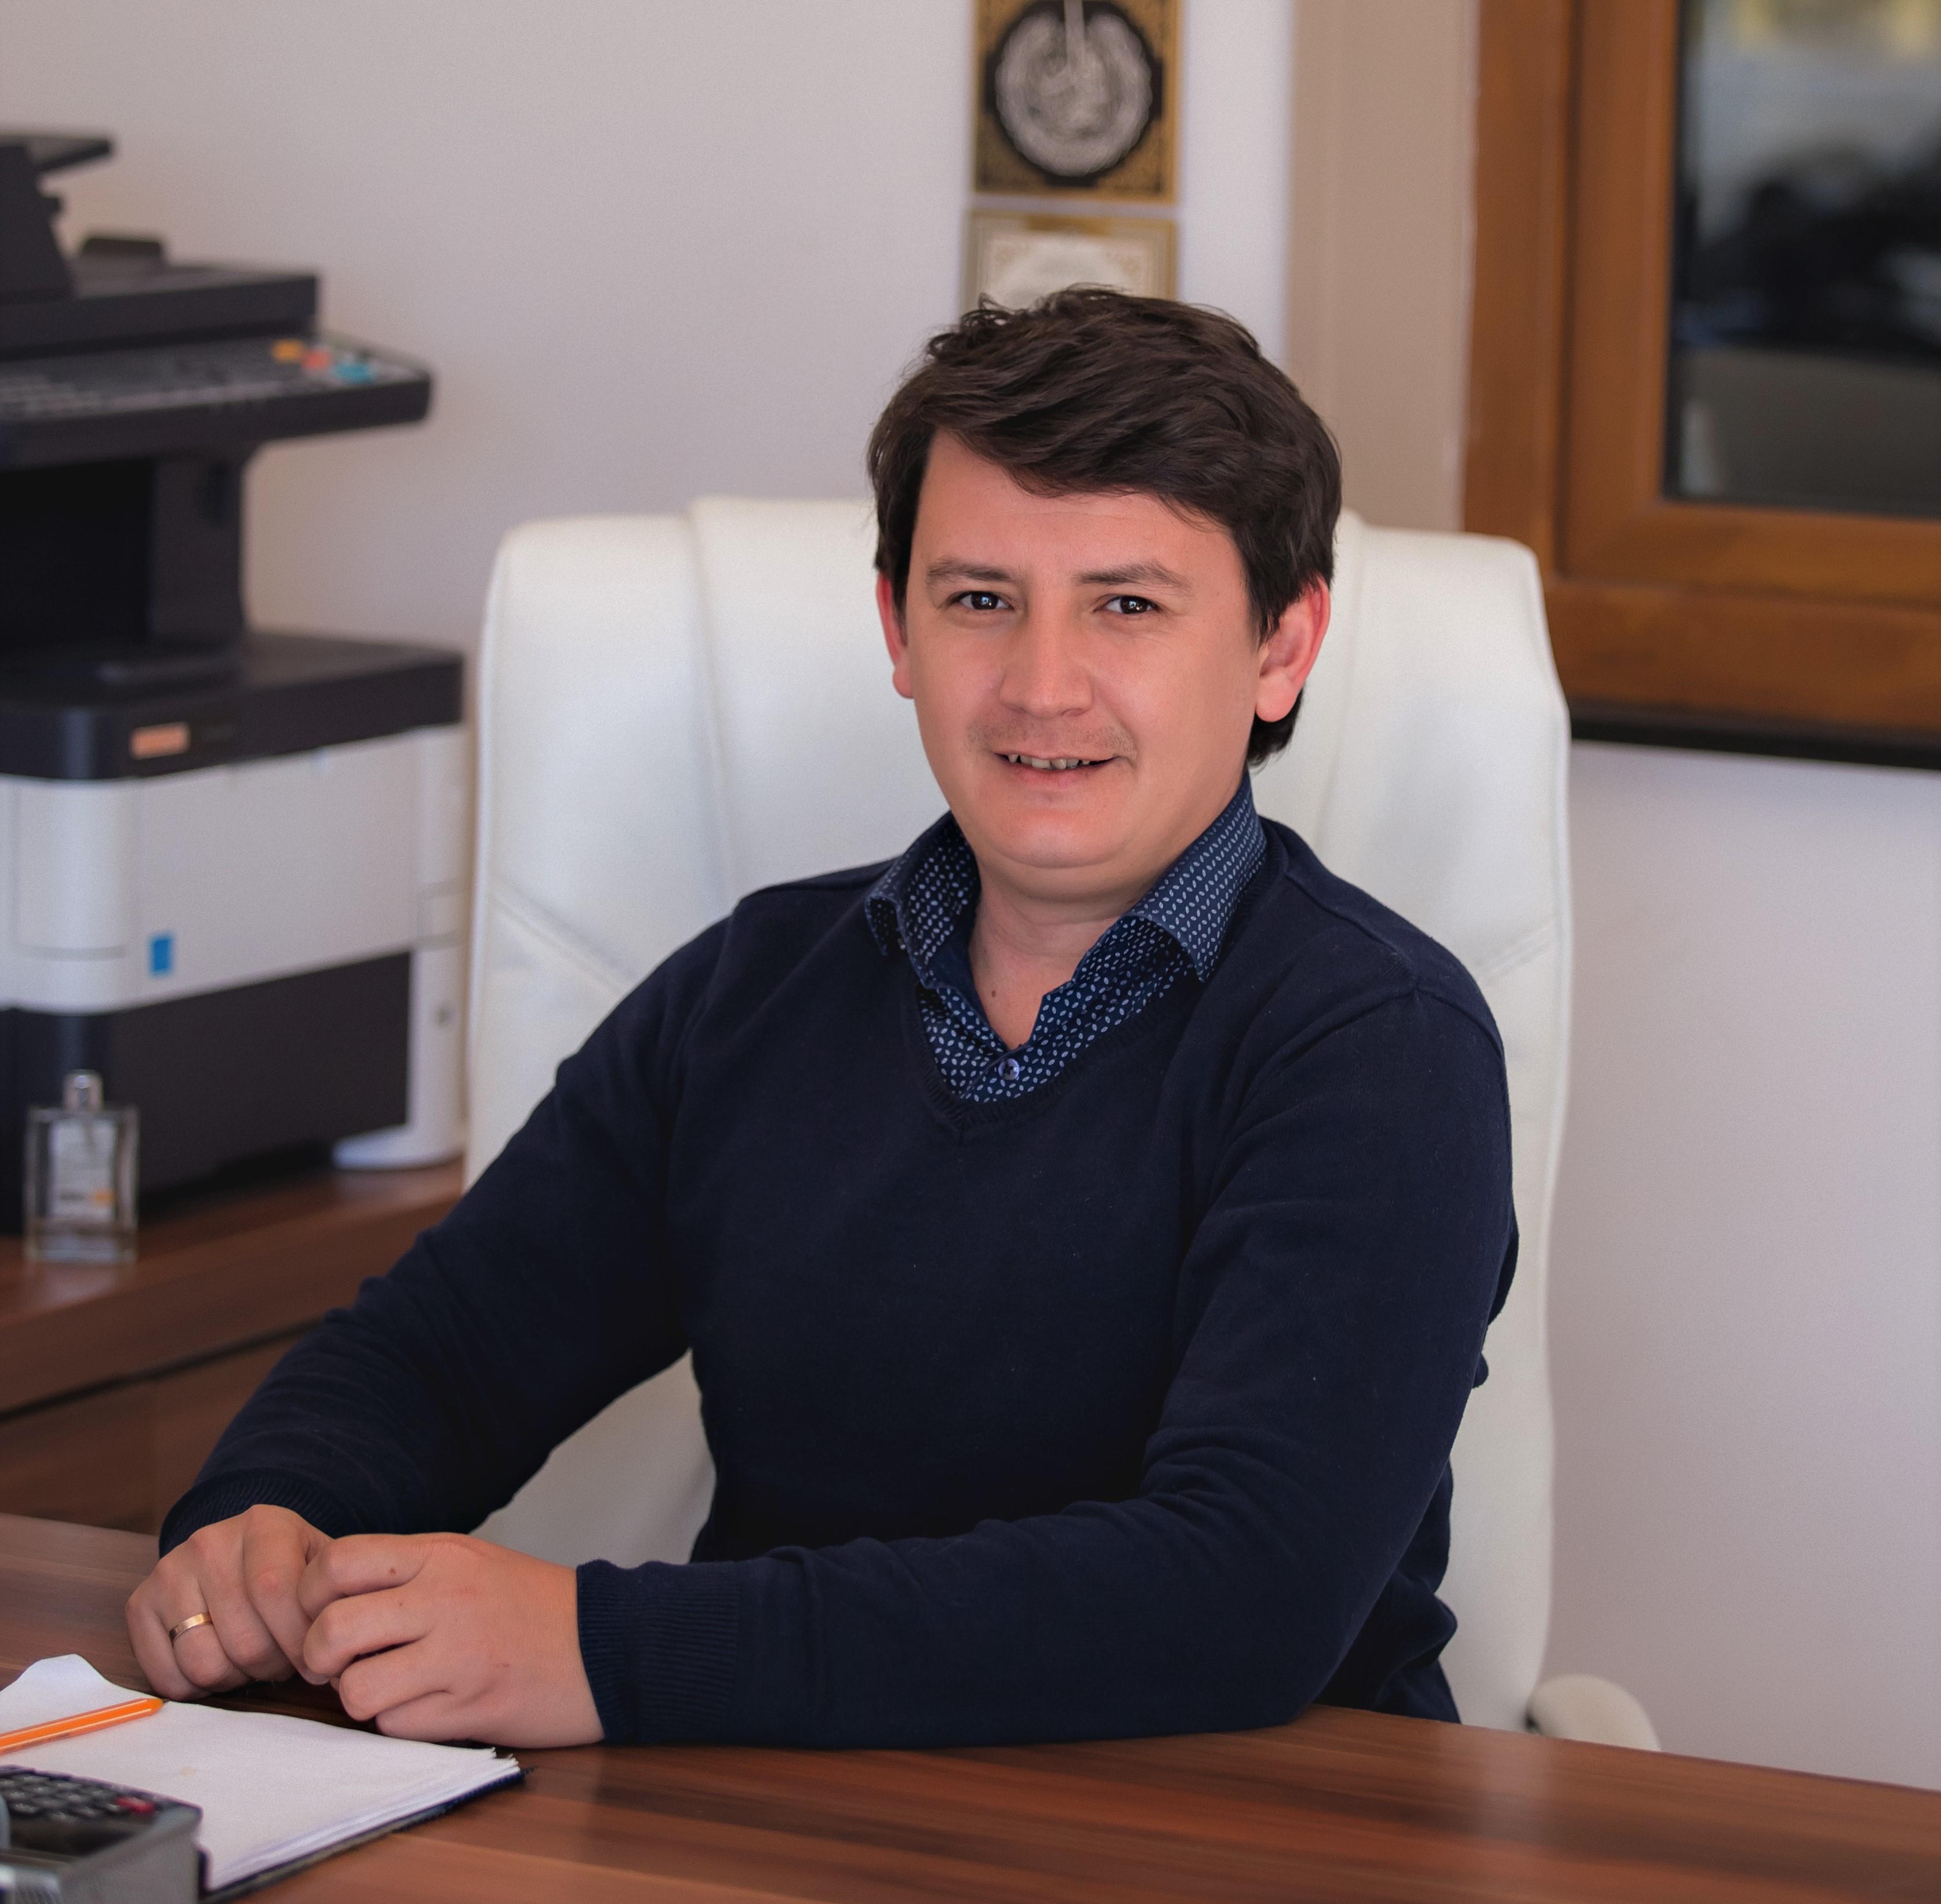 İbrahim Sual - Genel Koordinatör